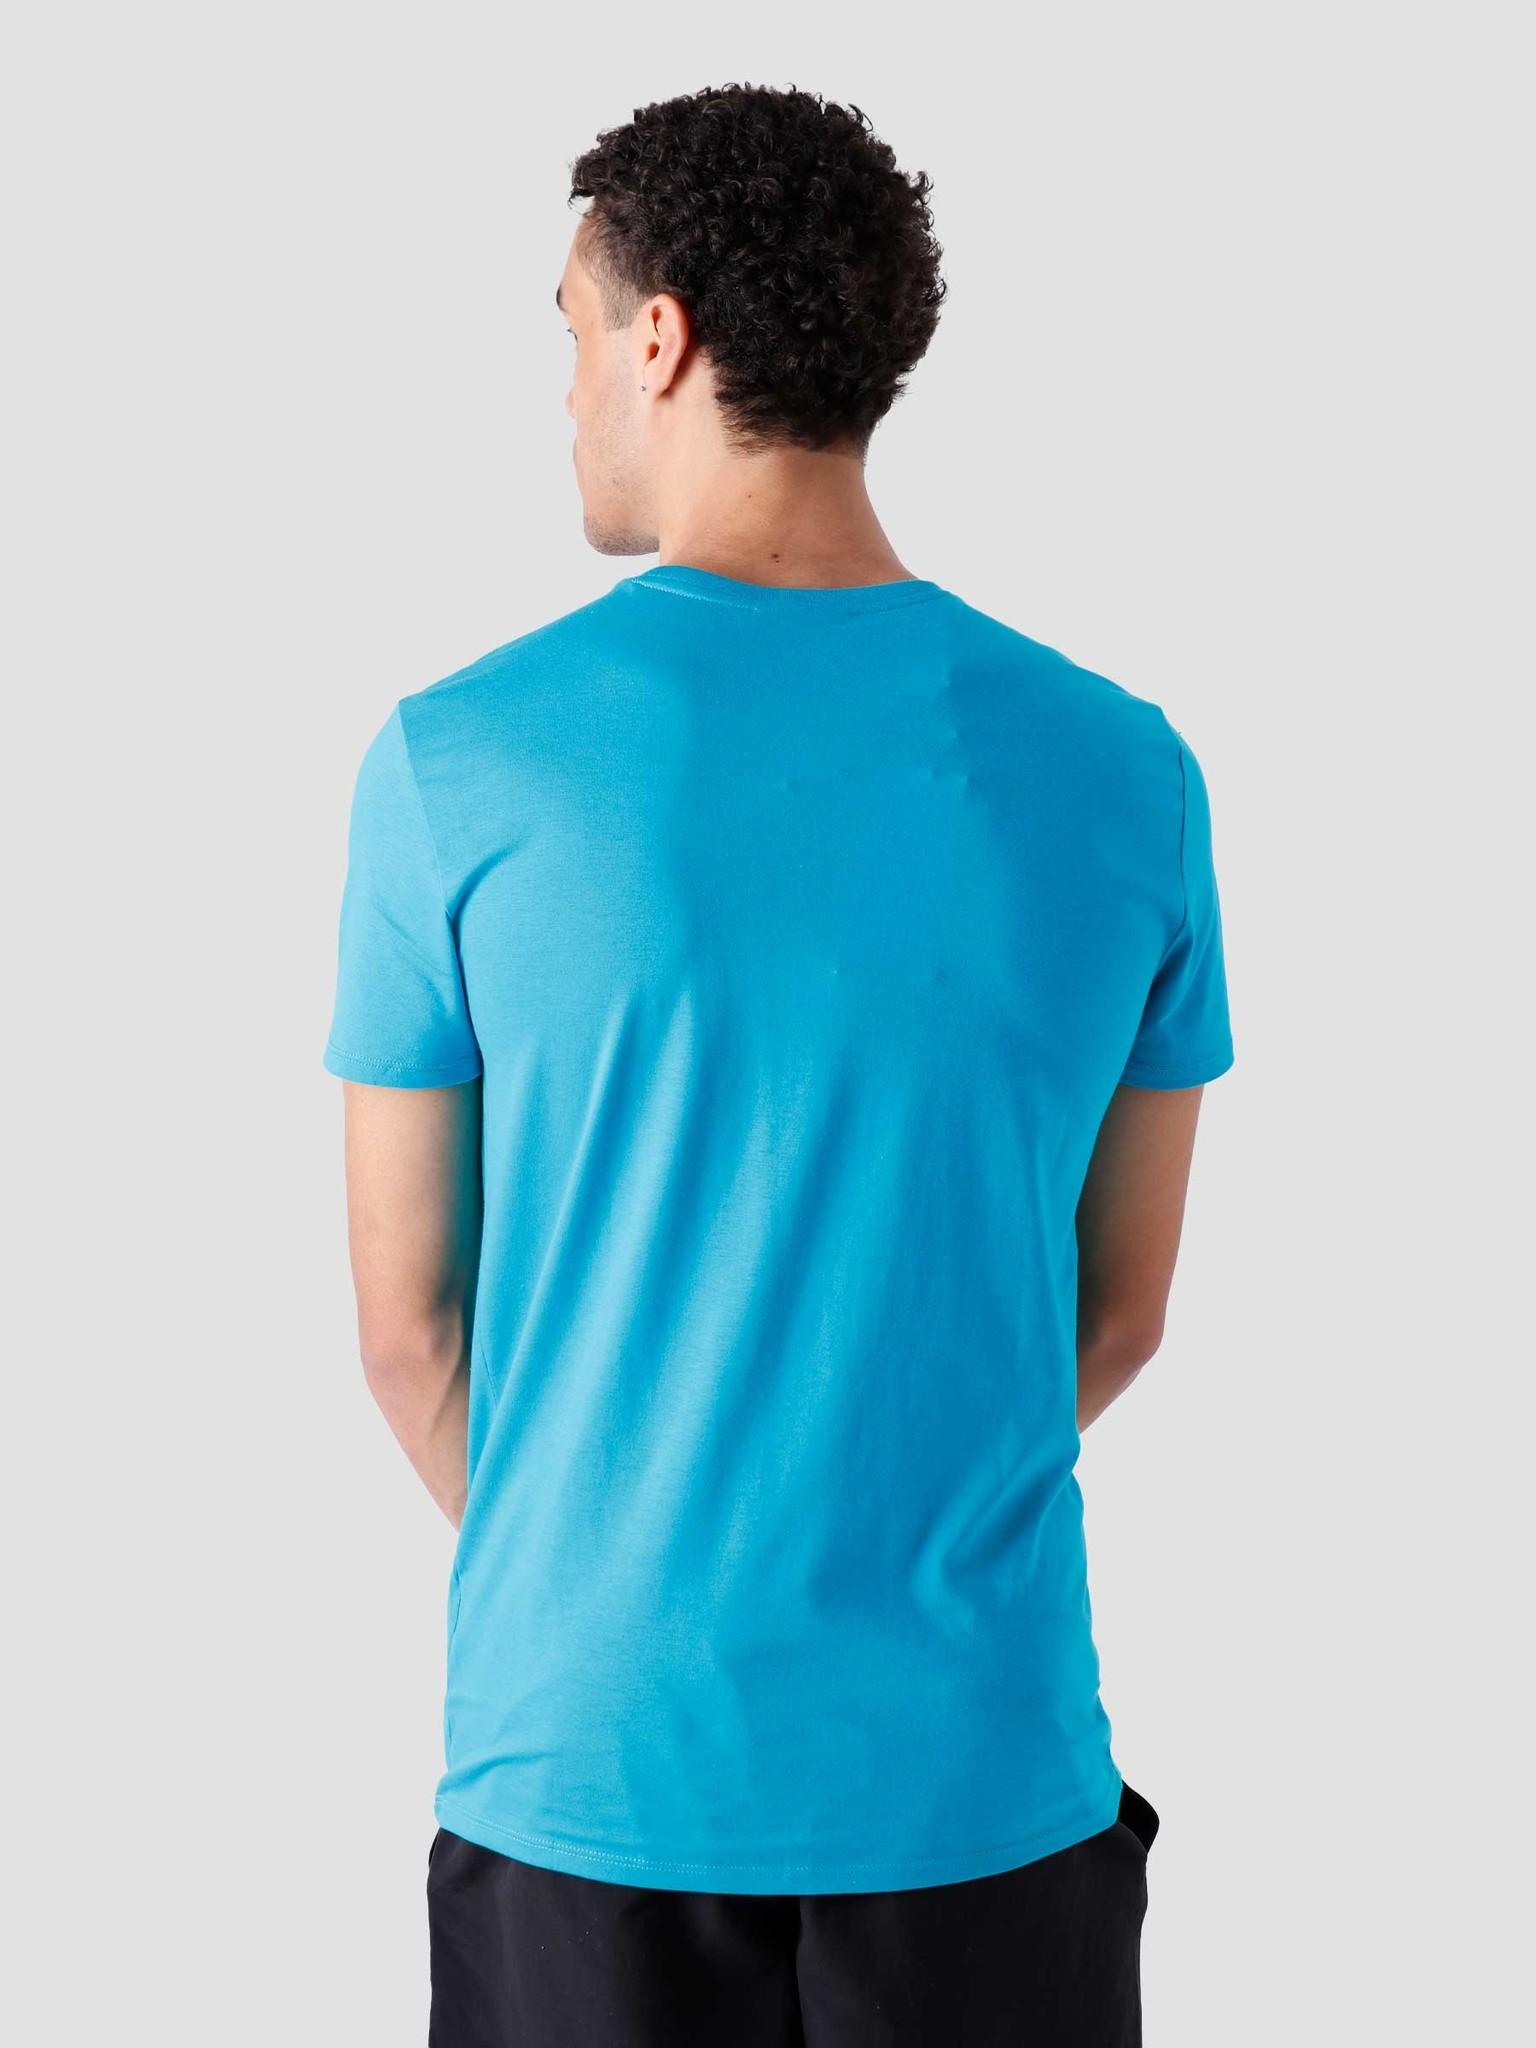 Lacoste Lacoste 1HT1 Men's T-Shirt Reef TH6709-11